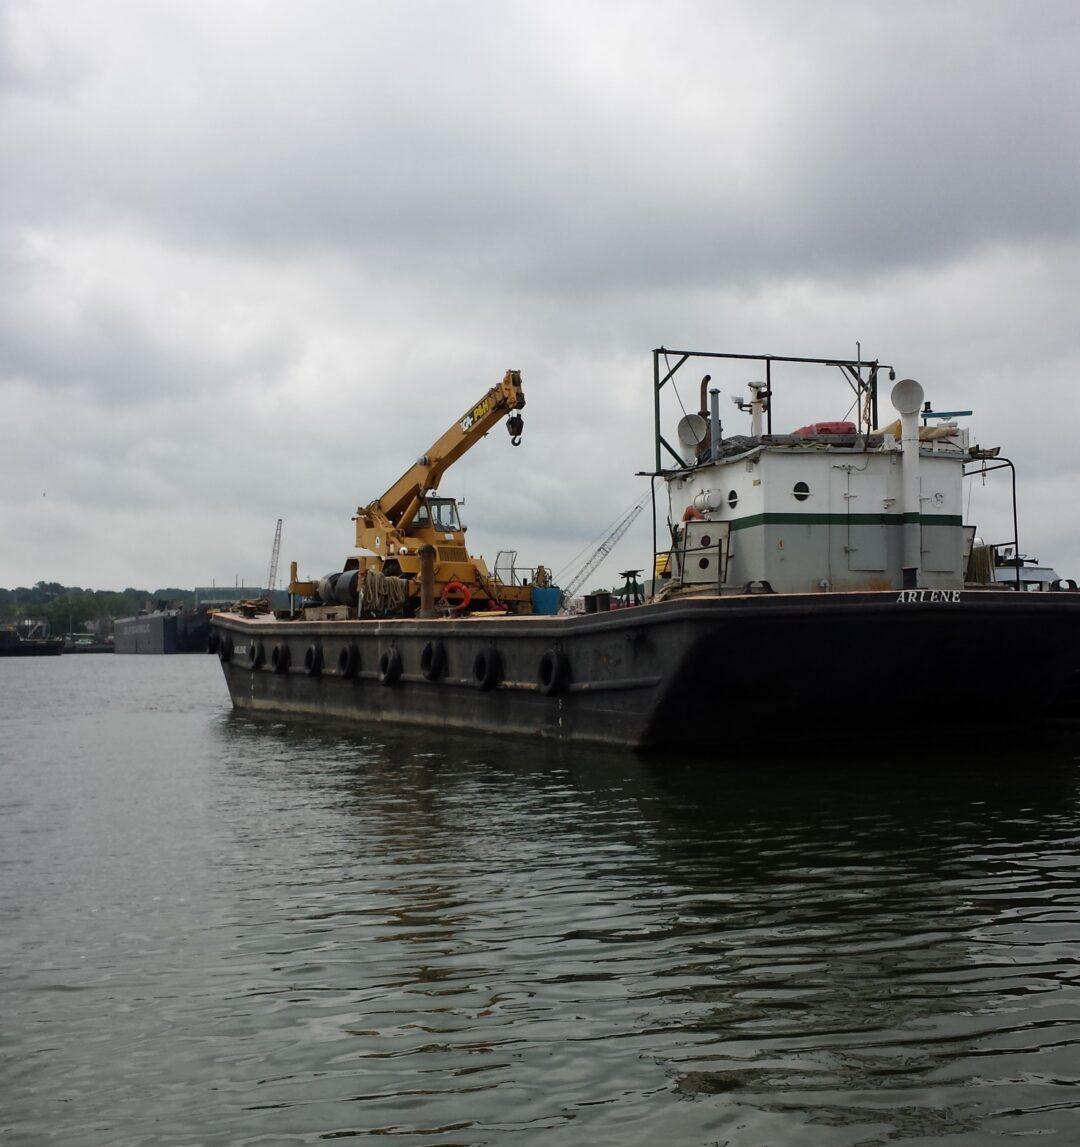 Crane Barge Arlene